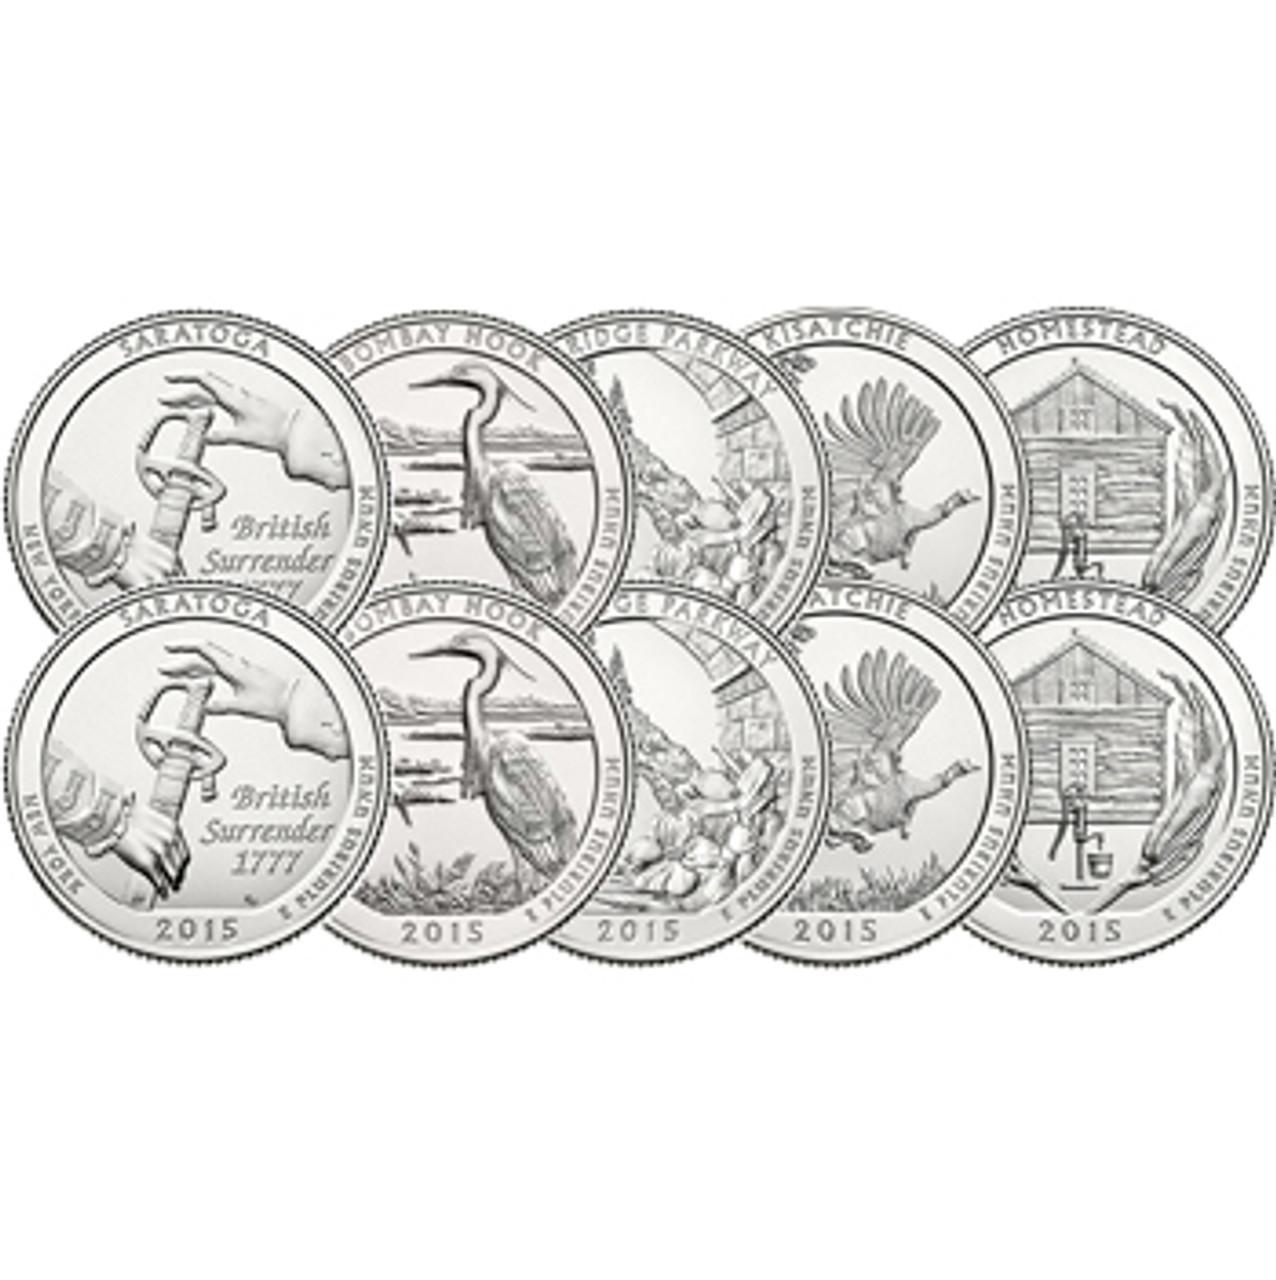 2015 P & D National Parks Quarter 10 Coins Brilliant Uncirculated Image 1